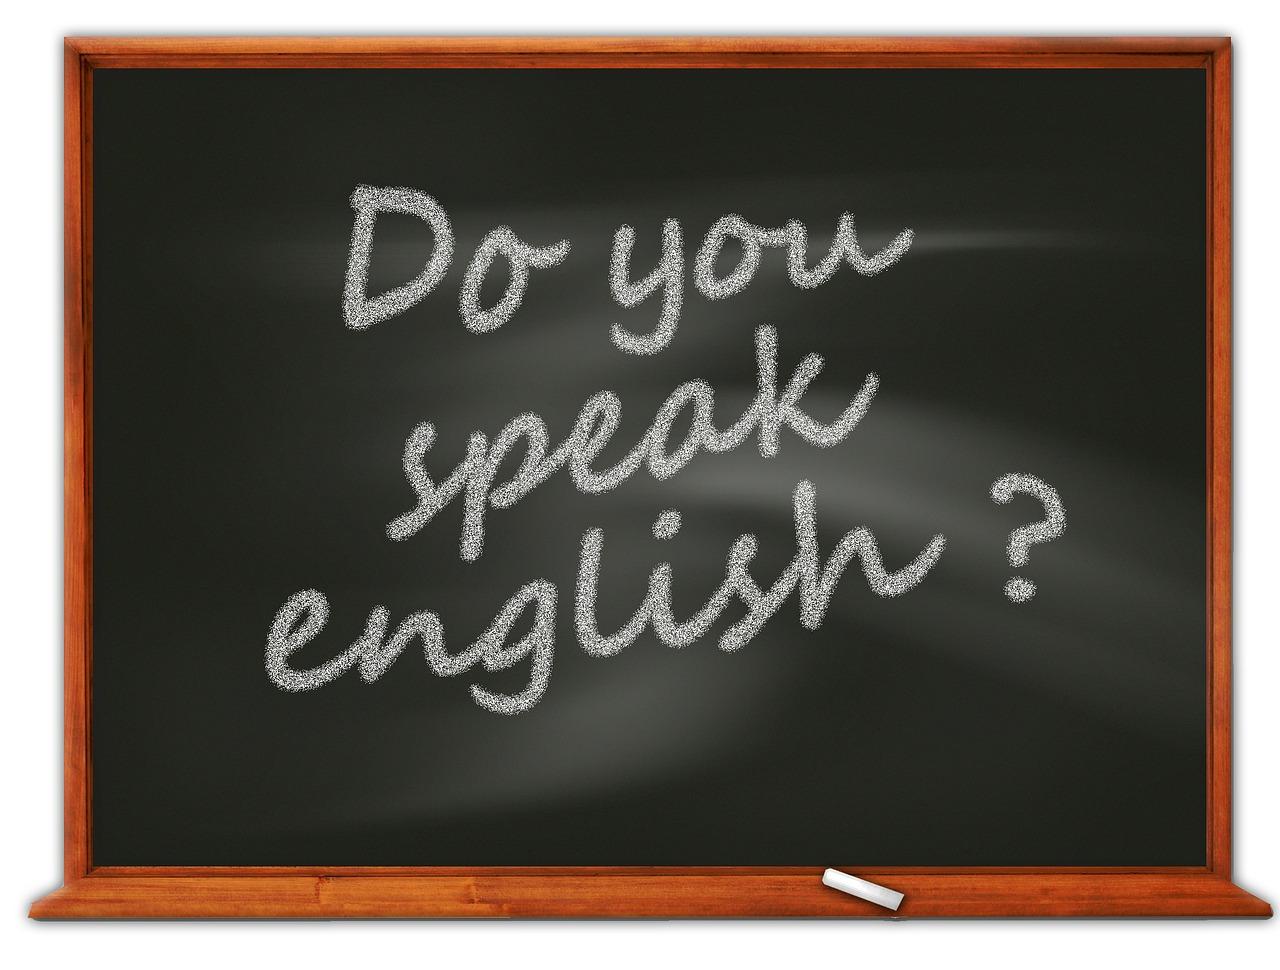 English language, Precognox